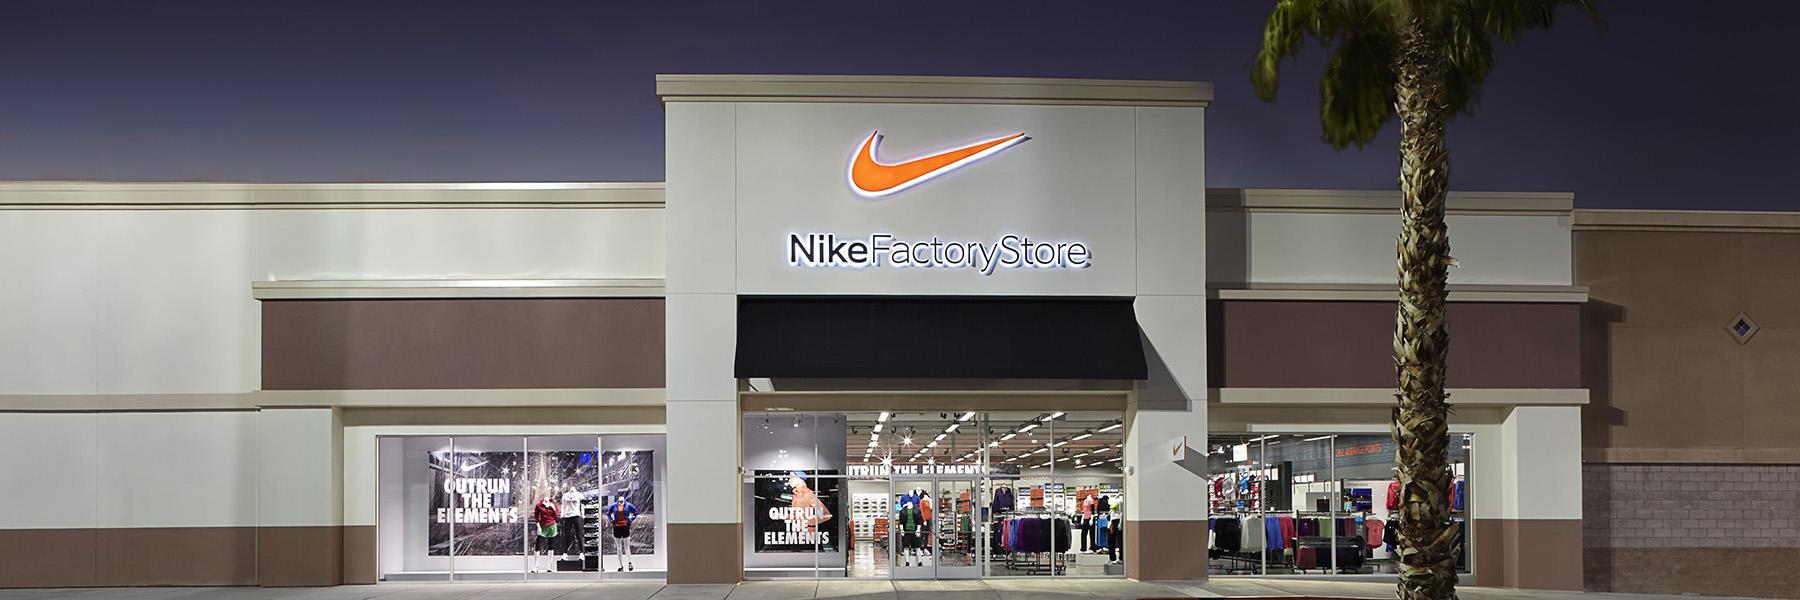 965f355689f4b Nike Factory Store - Henderson. Las Vegas